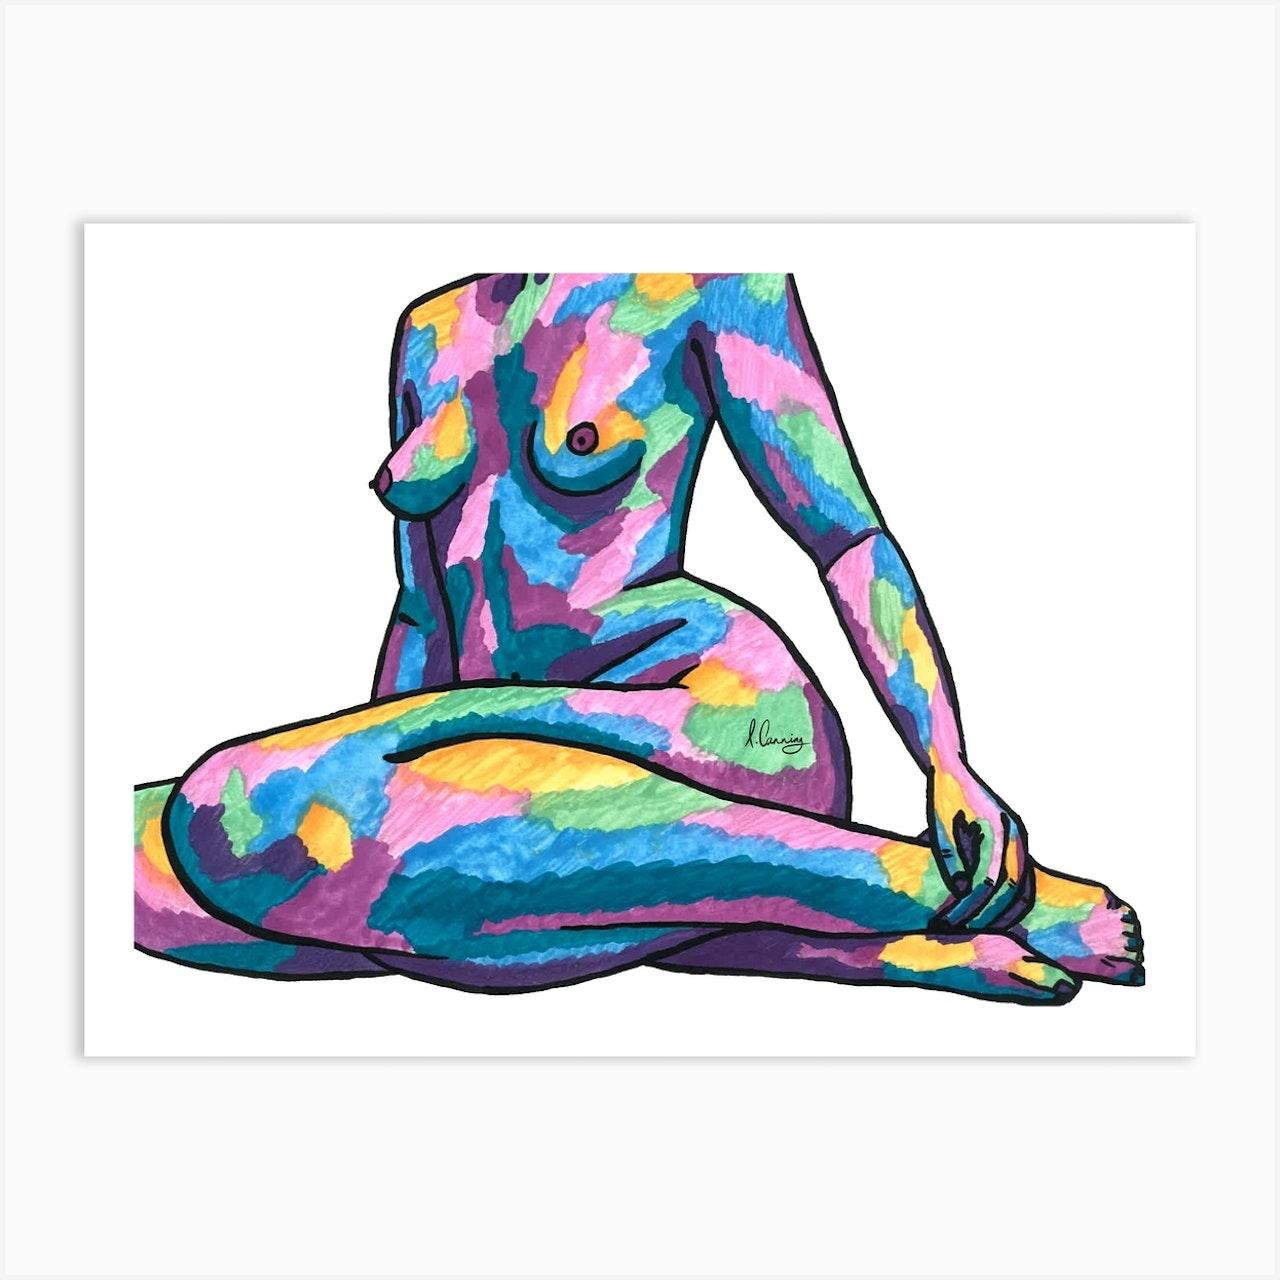 Nude Woman Aqua Tones Art Print by Art by Izzy - Fy